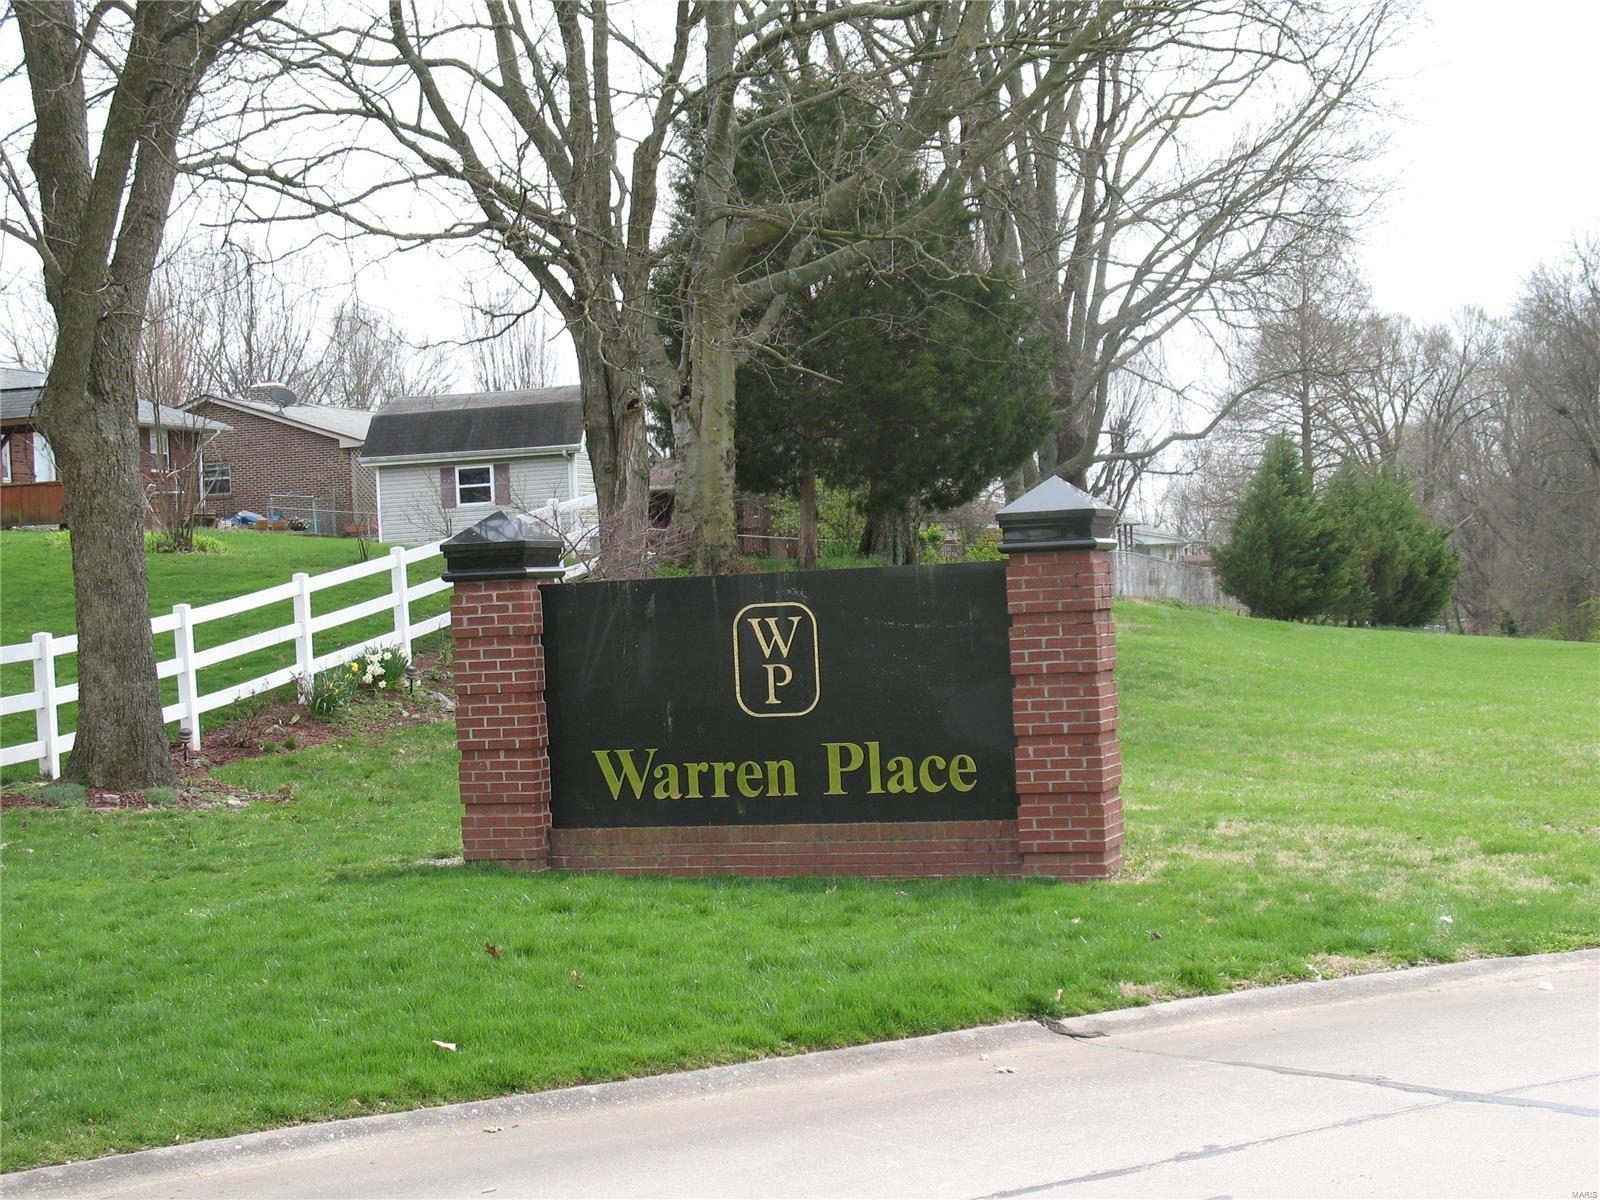 Photo of 1331 Warren Lake Drive #33, Jackson, MO 63755 (MLS # 21042282)